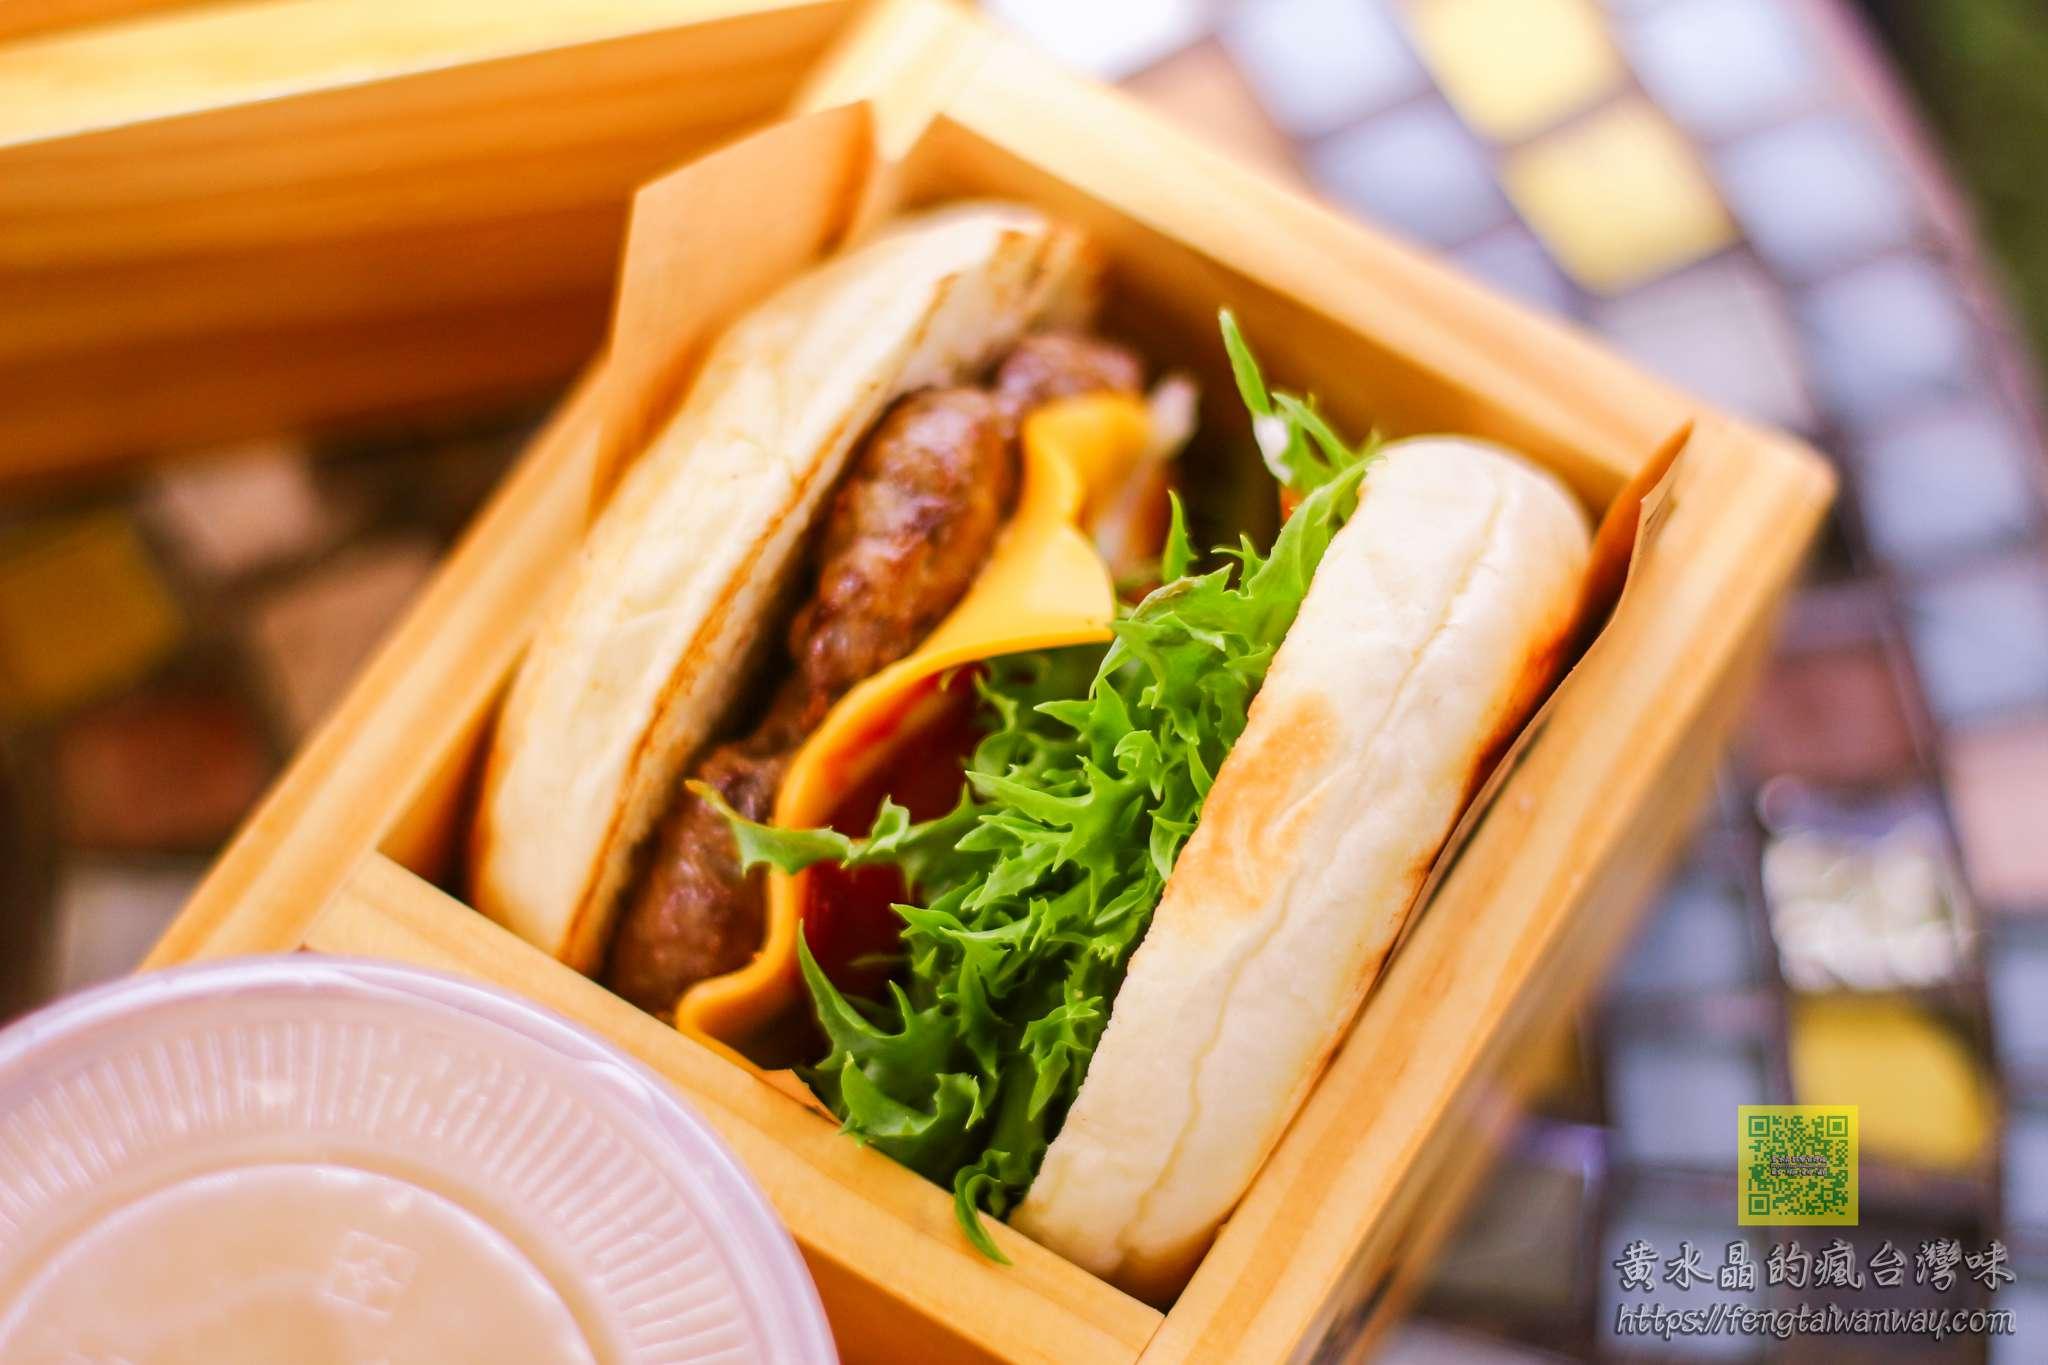 GoGoBox餐車【大溪美食】|北橫台七線網美、親子、寵物一定要來拍的美式餐車;重機車友的休息站(含公車資訊) @黃水晶的瘋台灣味